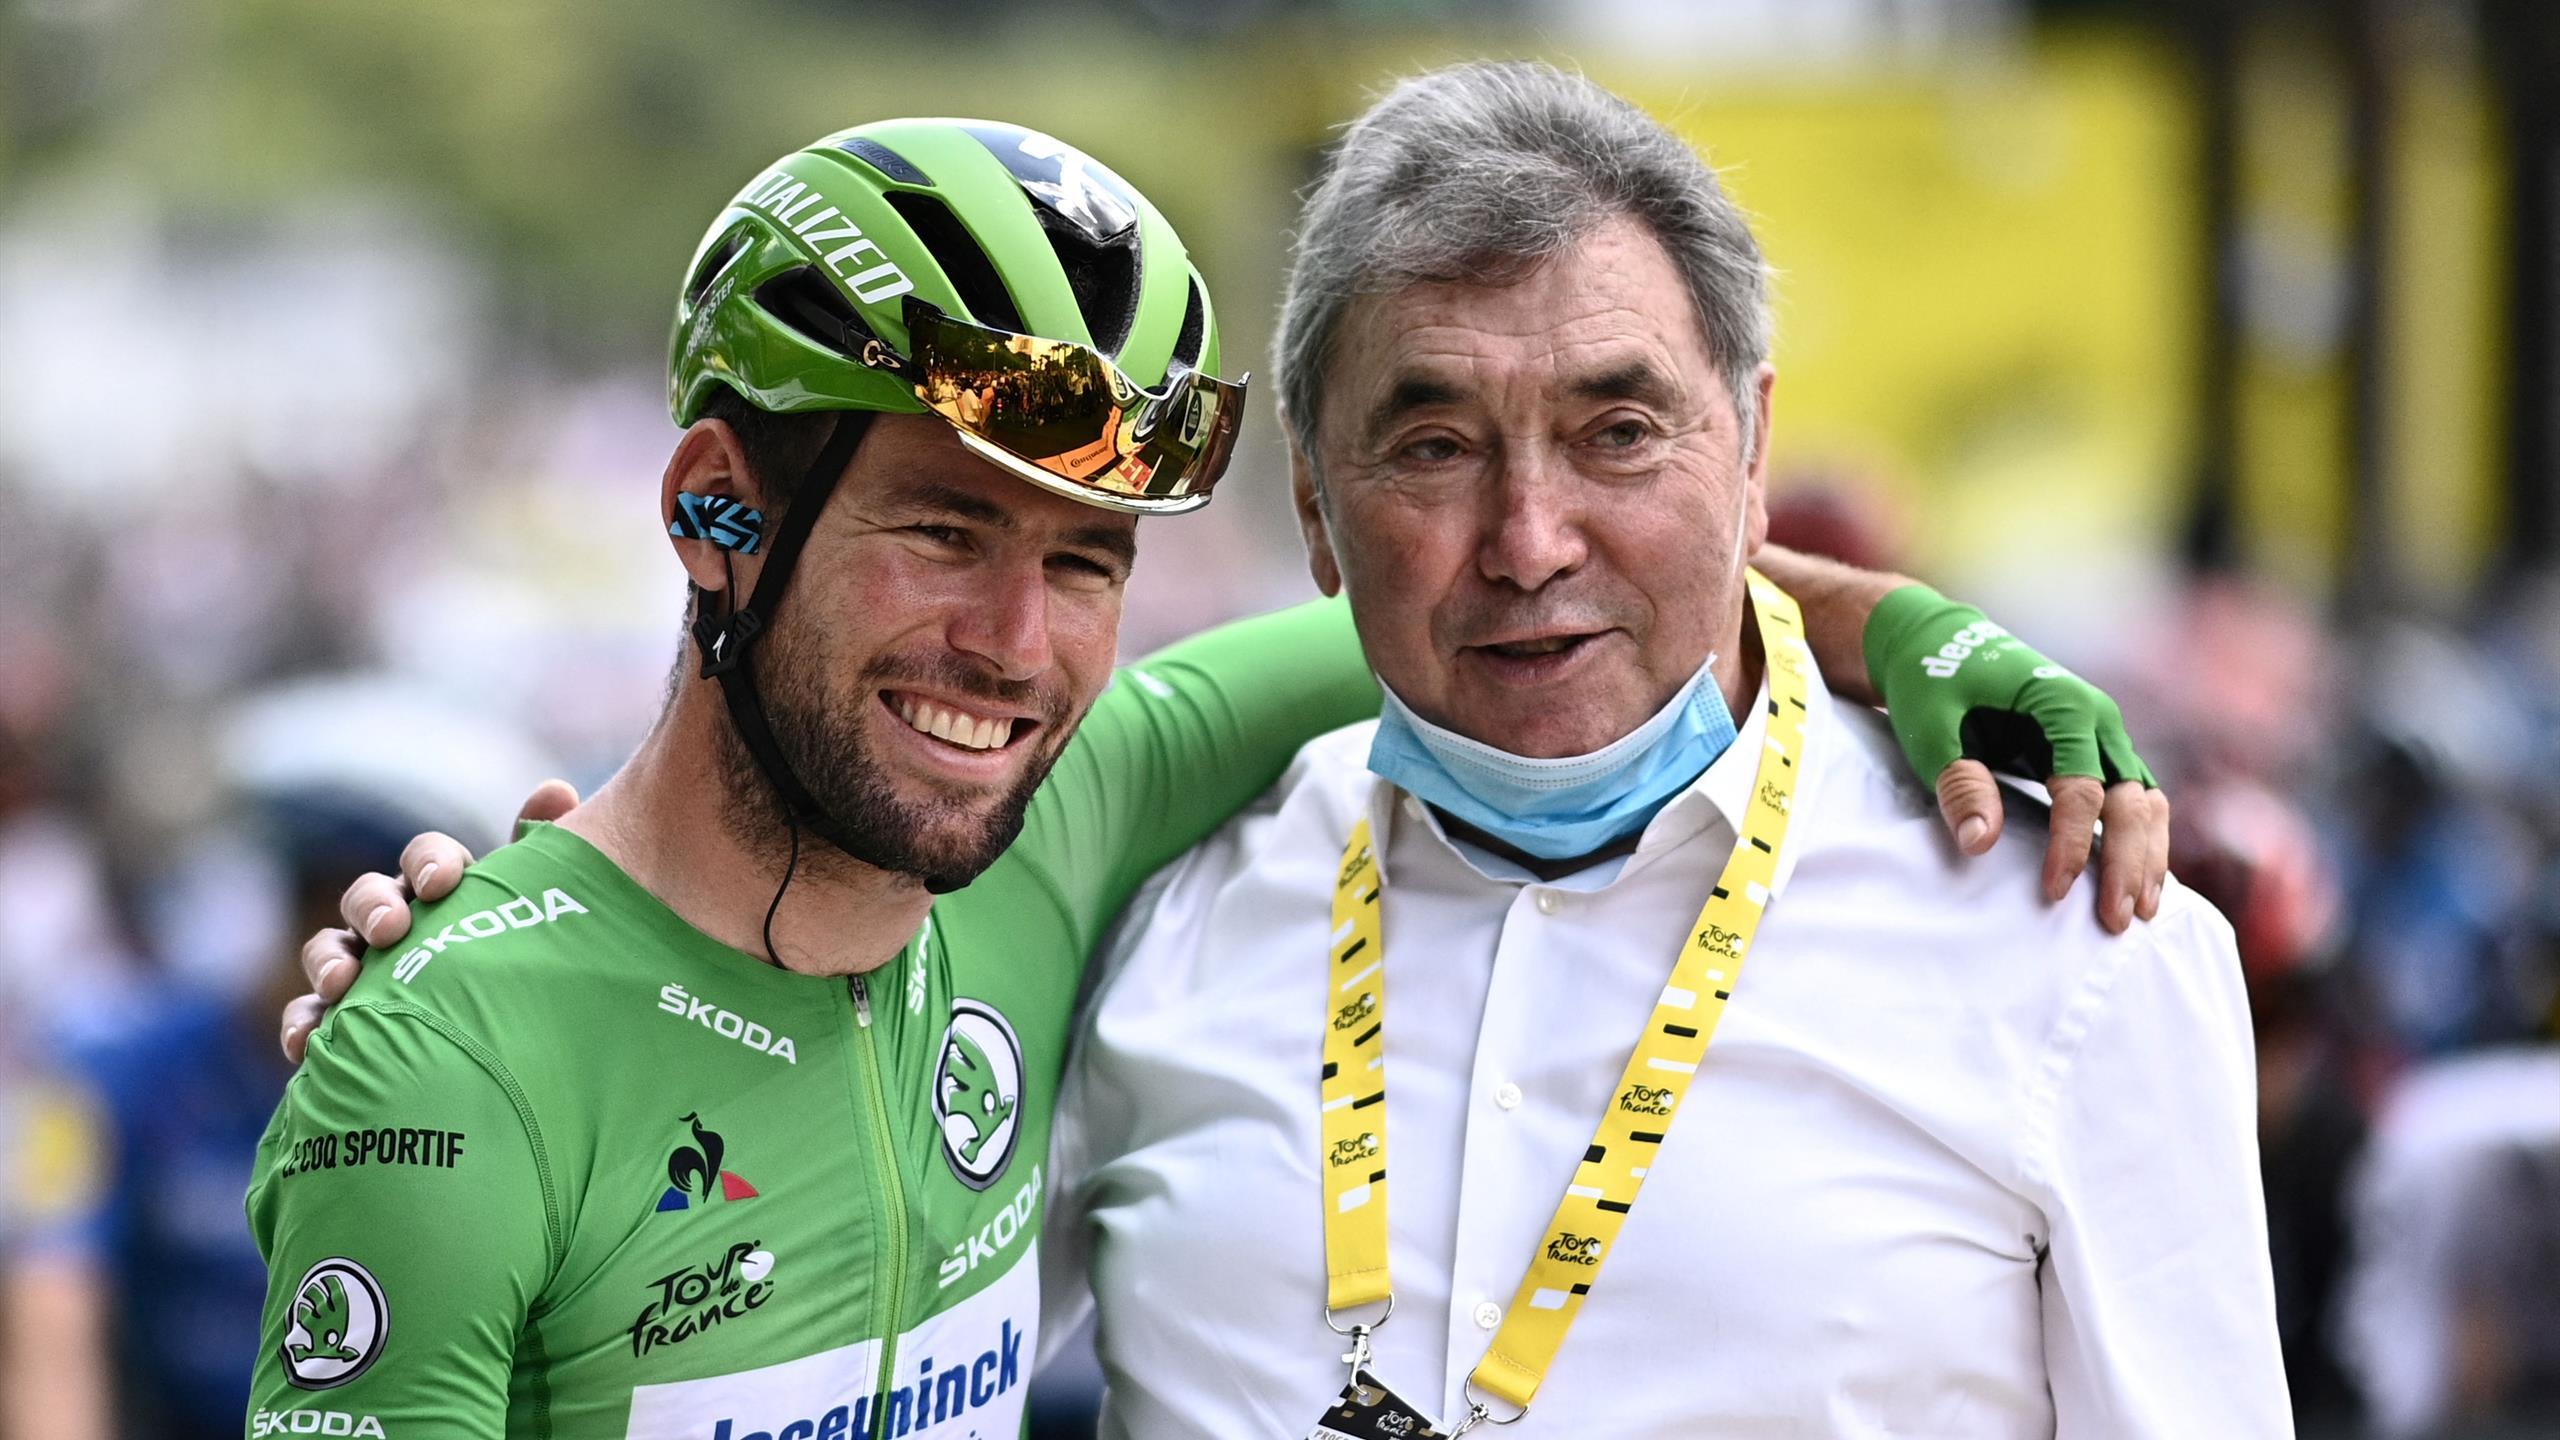 Une accolade à 68 victoires : Quand Cavendish tombe dans les bras de Merckx